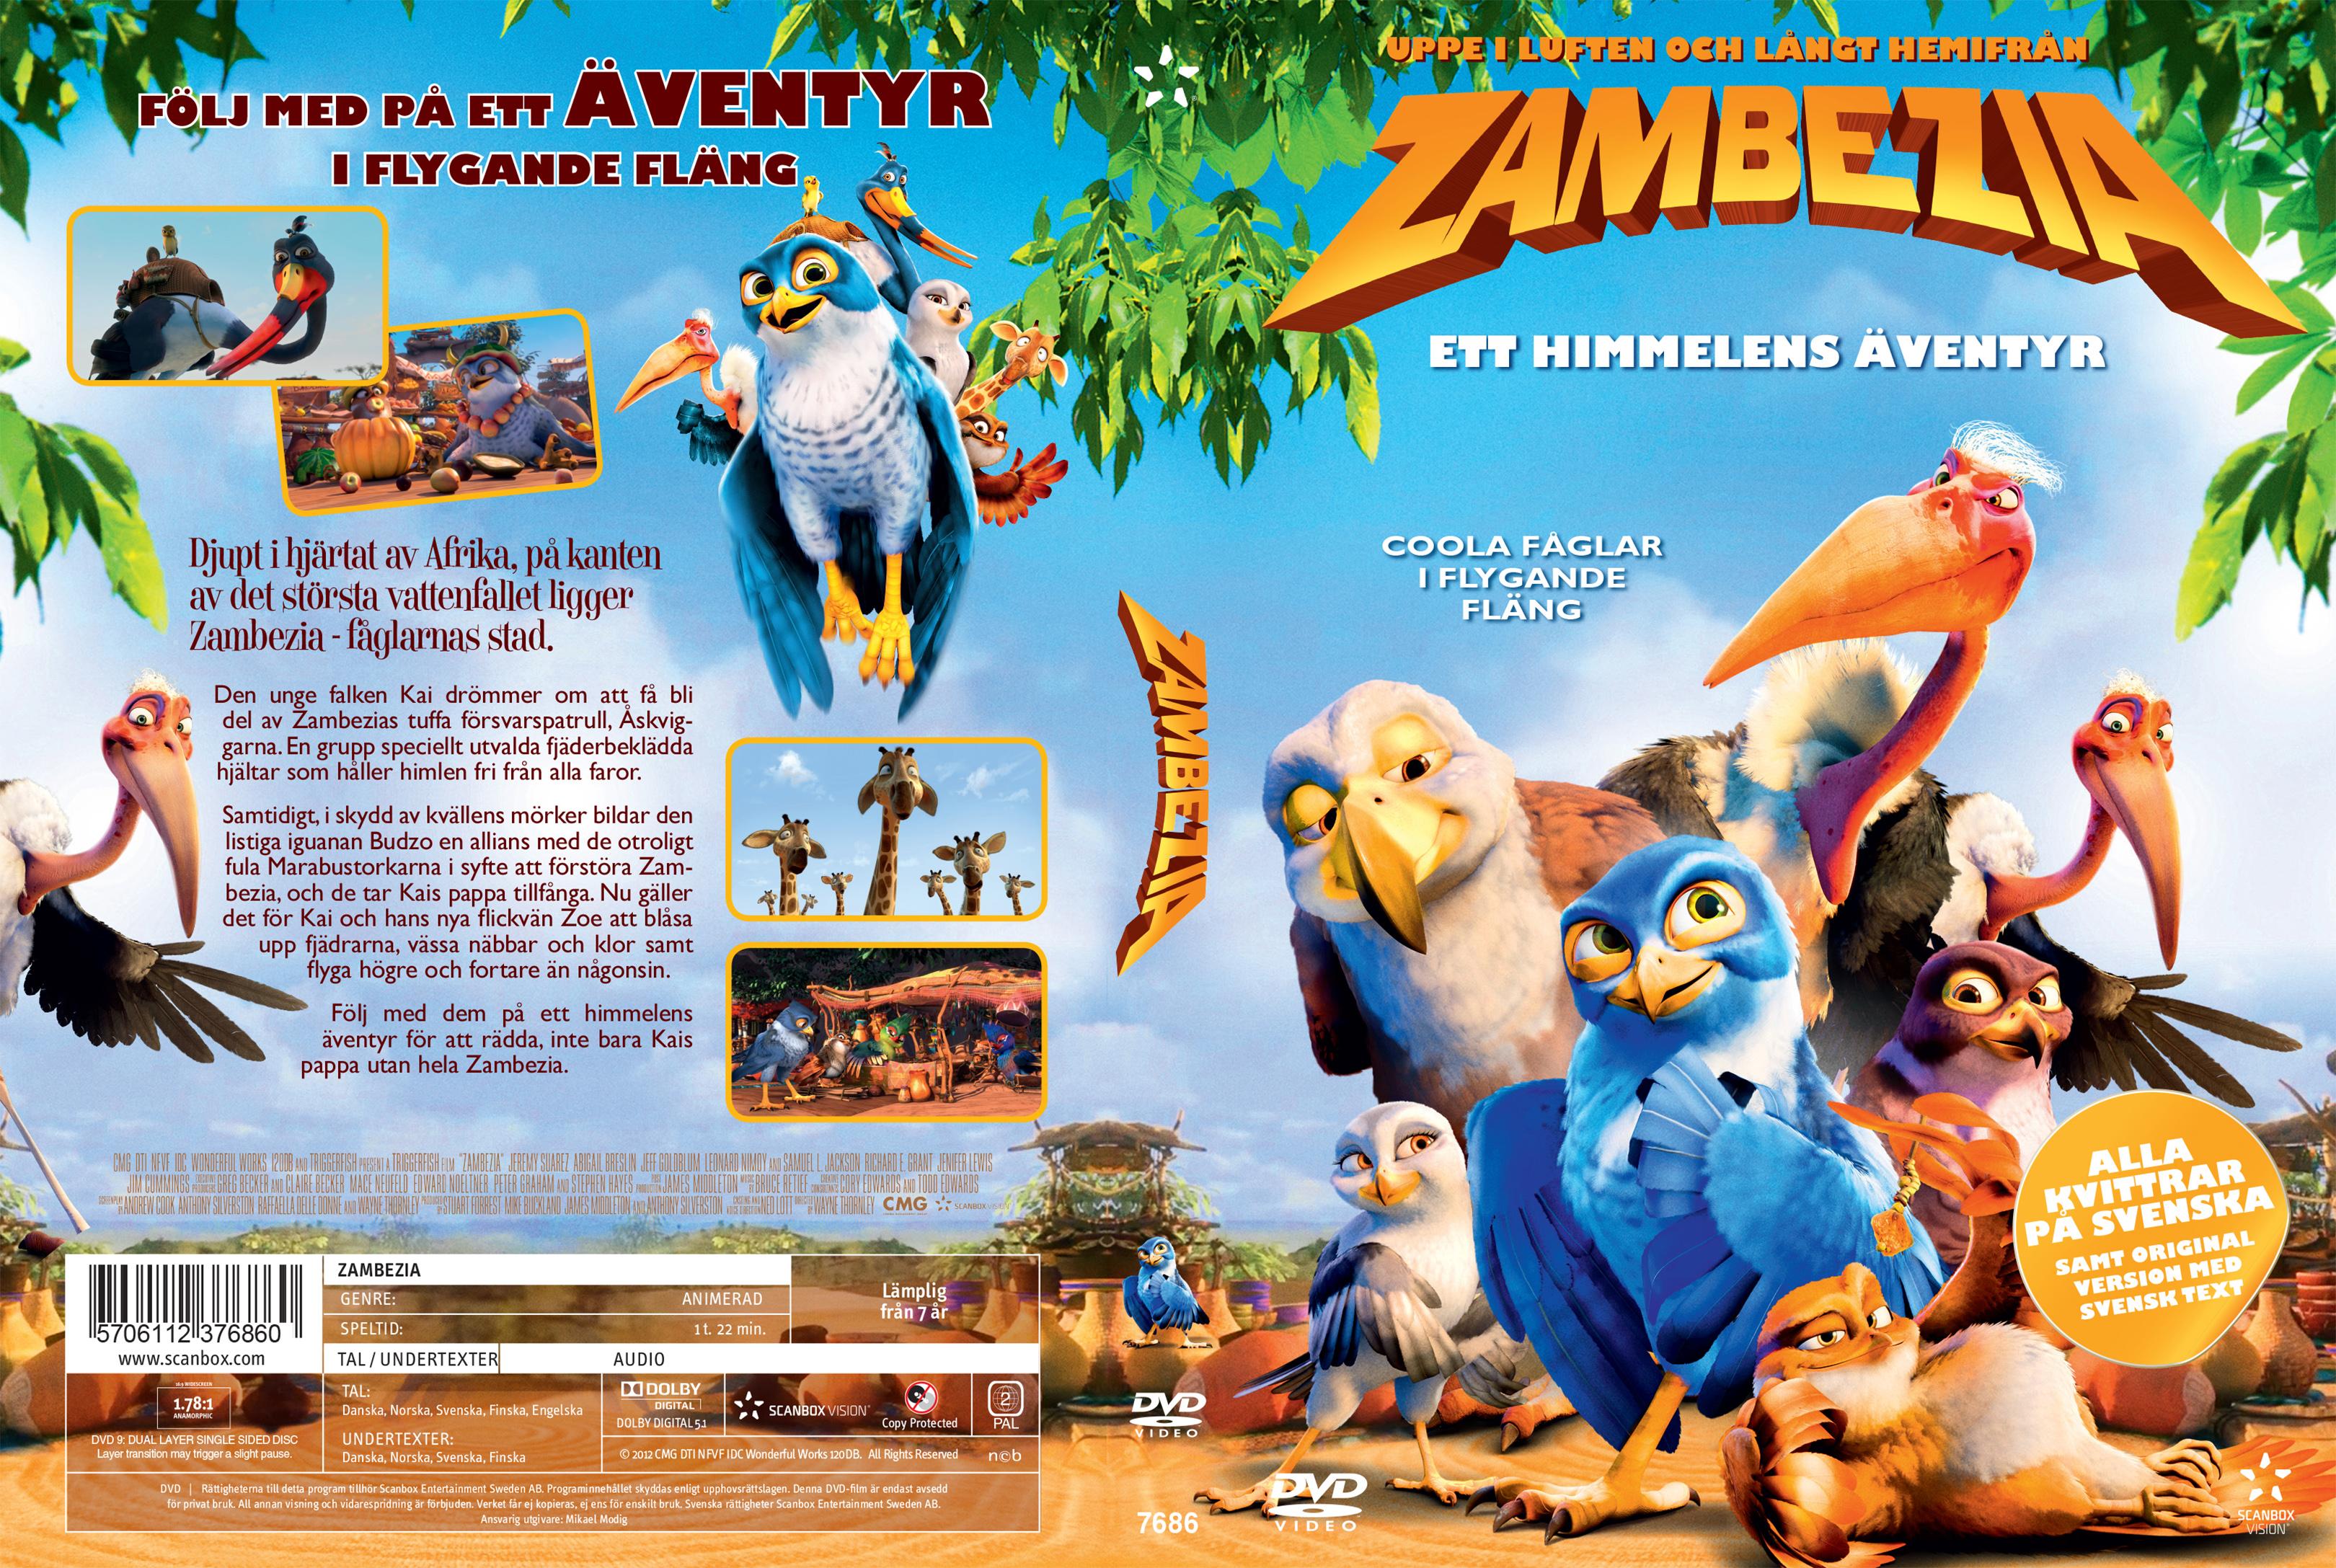 Zambezia full movie in hindi dubbed free download.